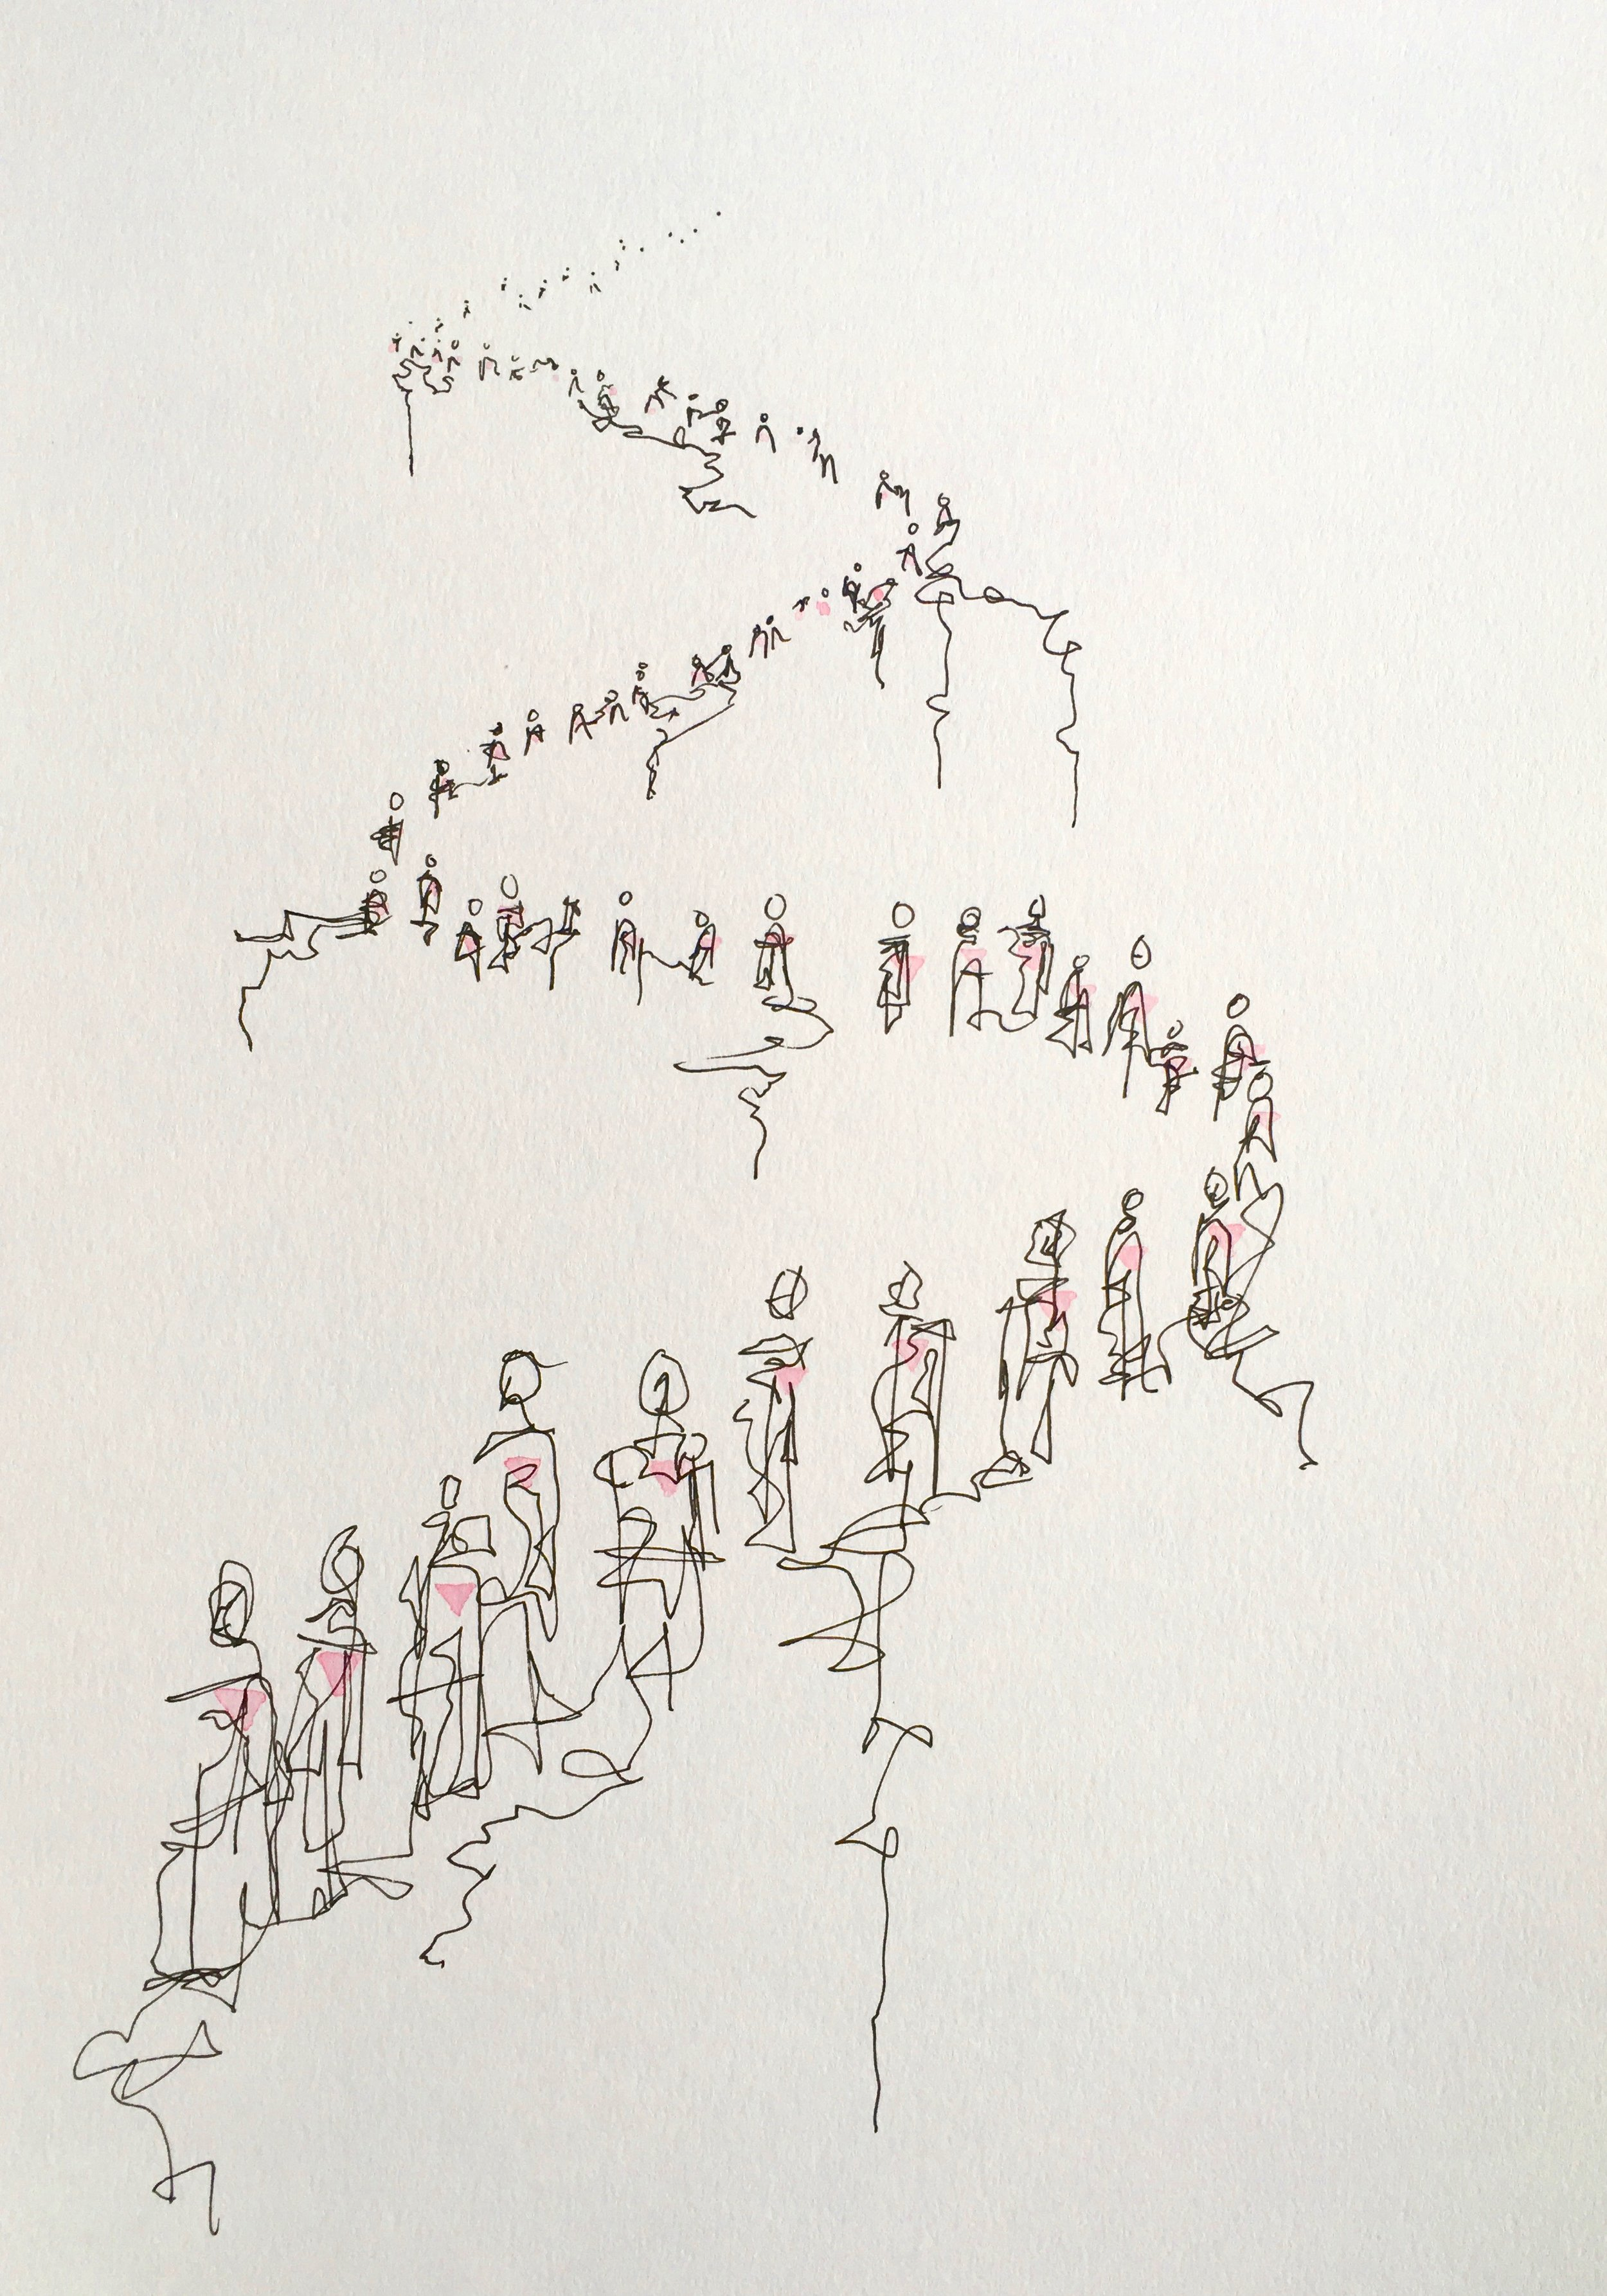 Prisoner March